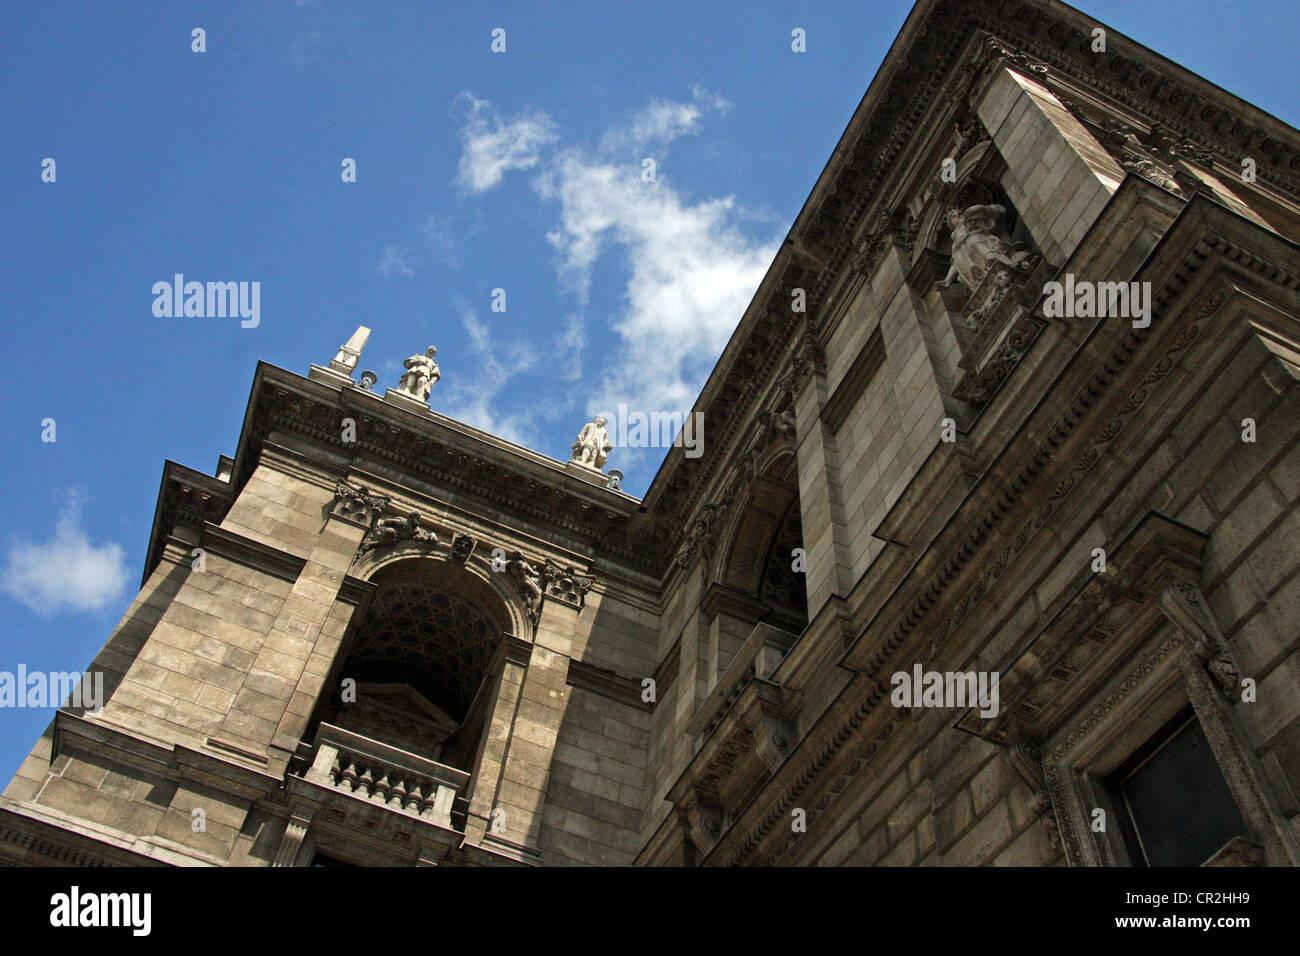 The Hungarian State Opera House (Hungarian: Magyar Állami Operaház) is a neo-Renaissance opera house located - Stock Image